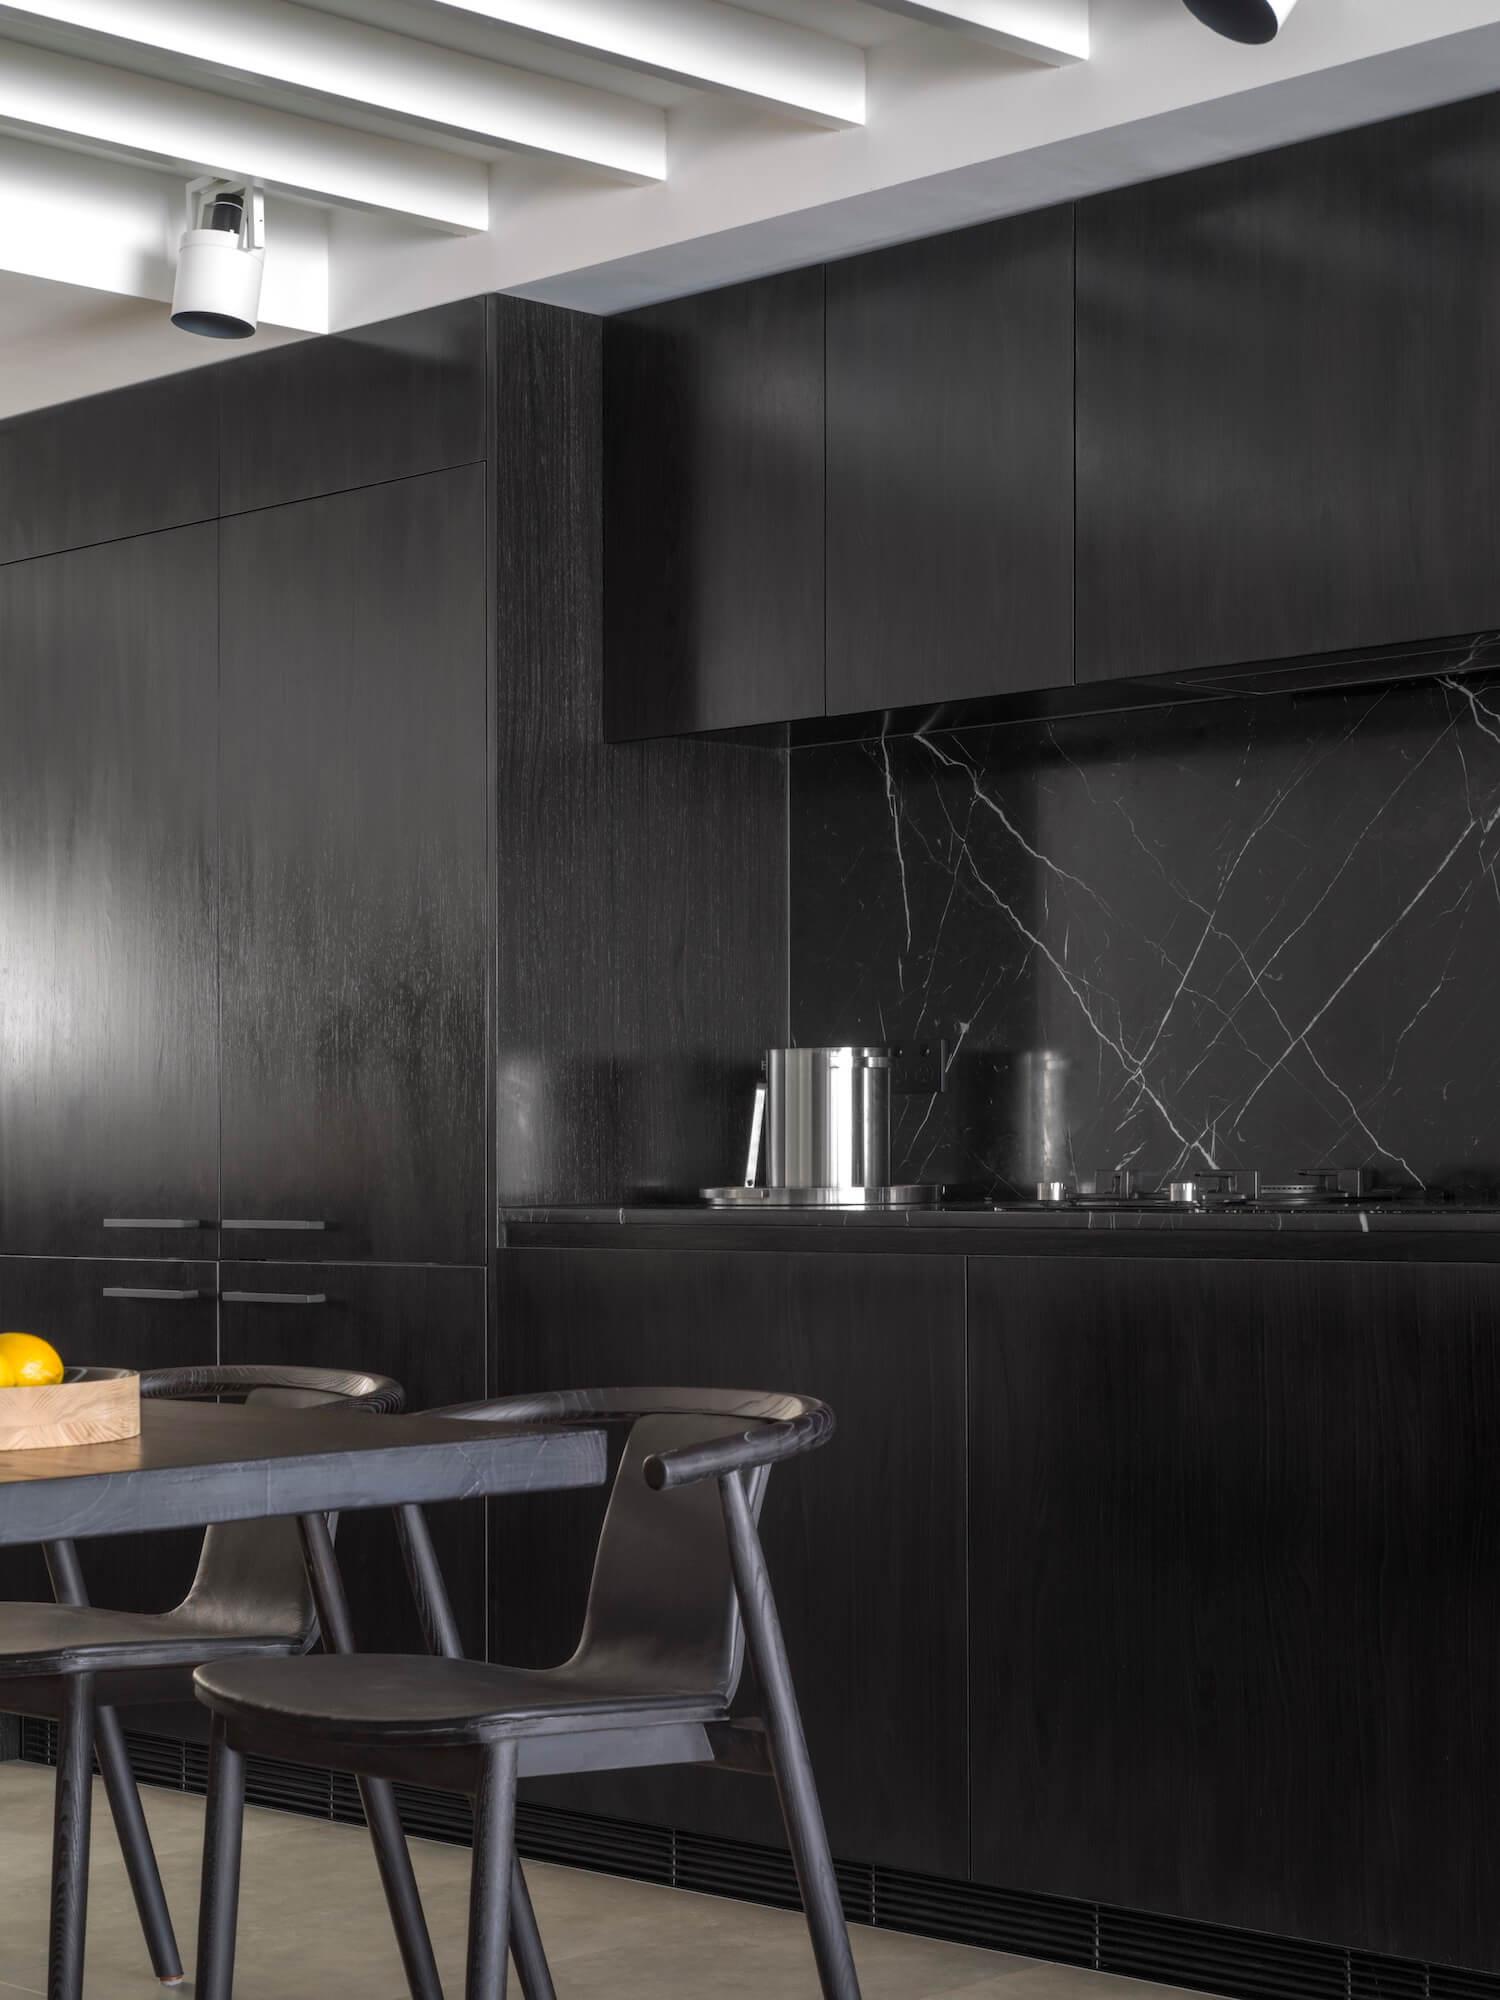 est living interiors lawless meyerson bondi apartment 6